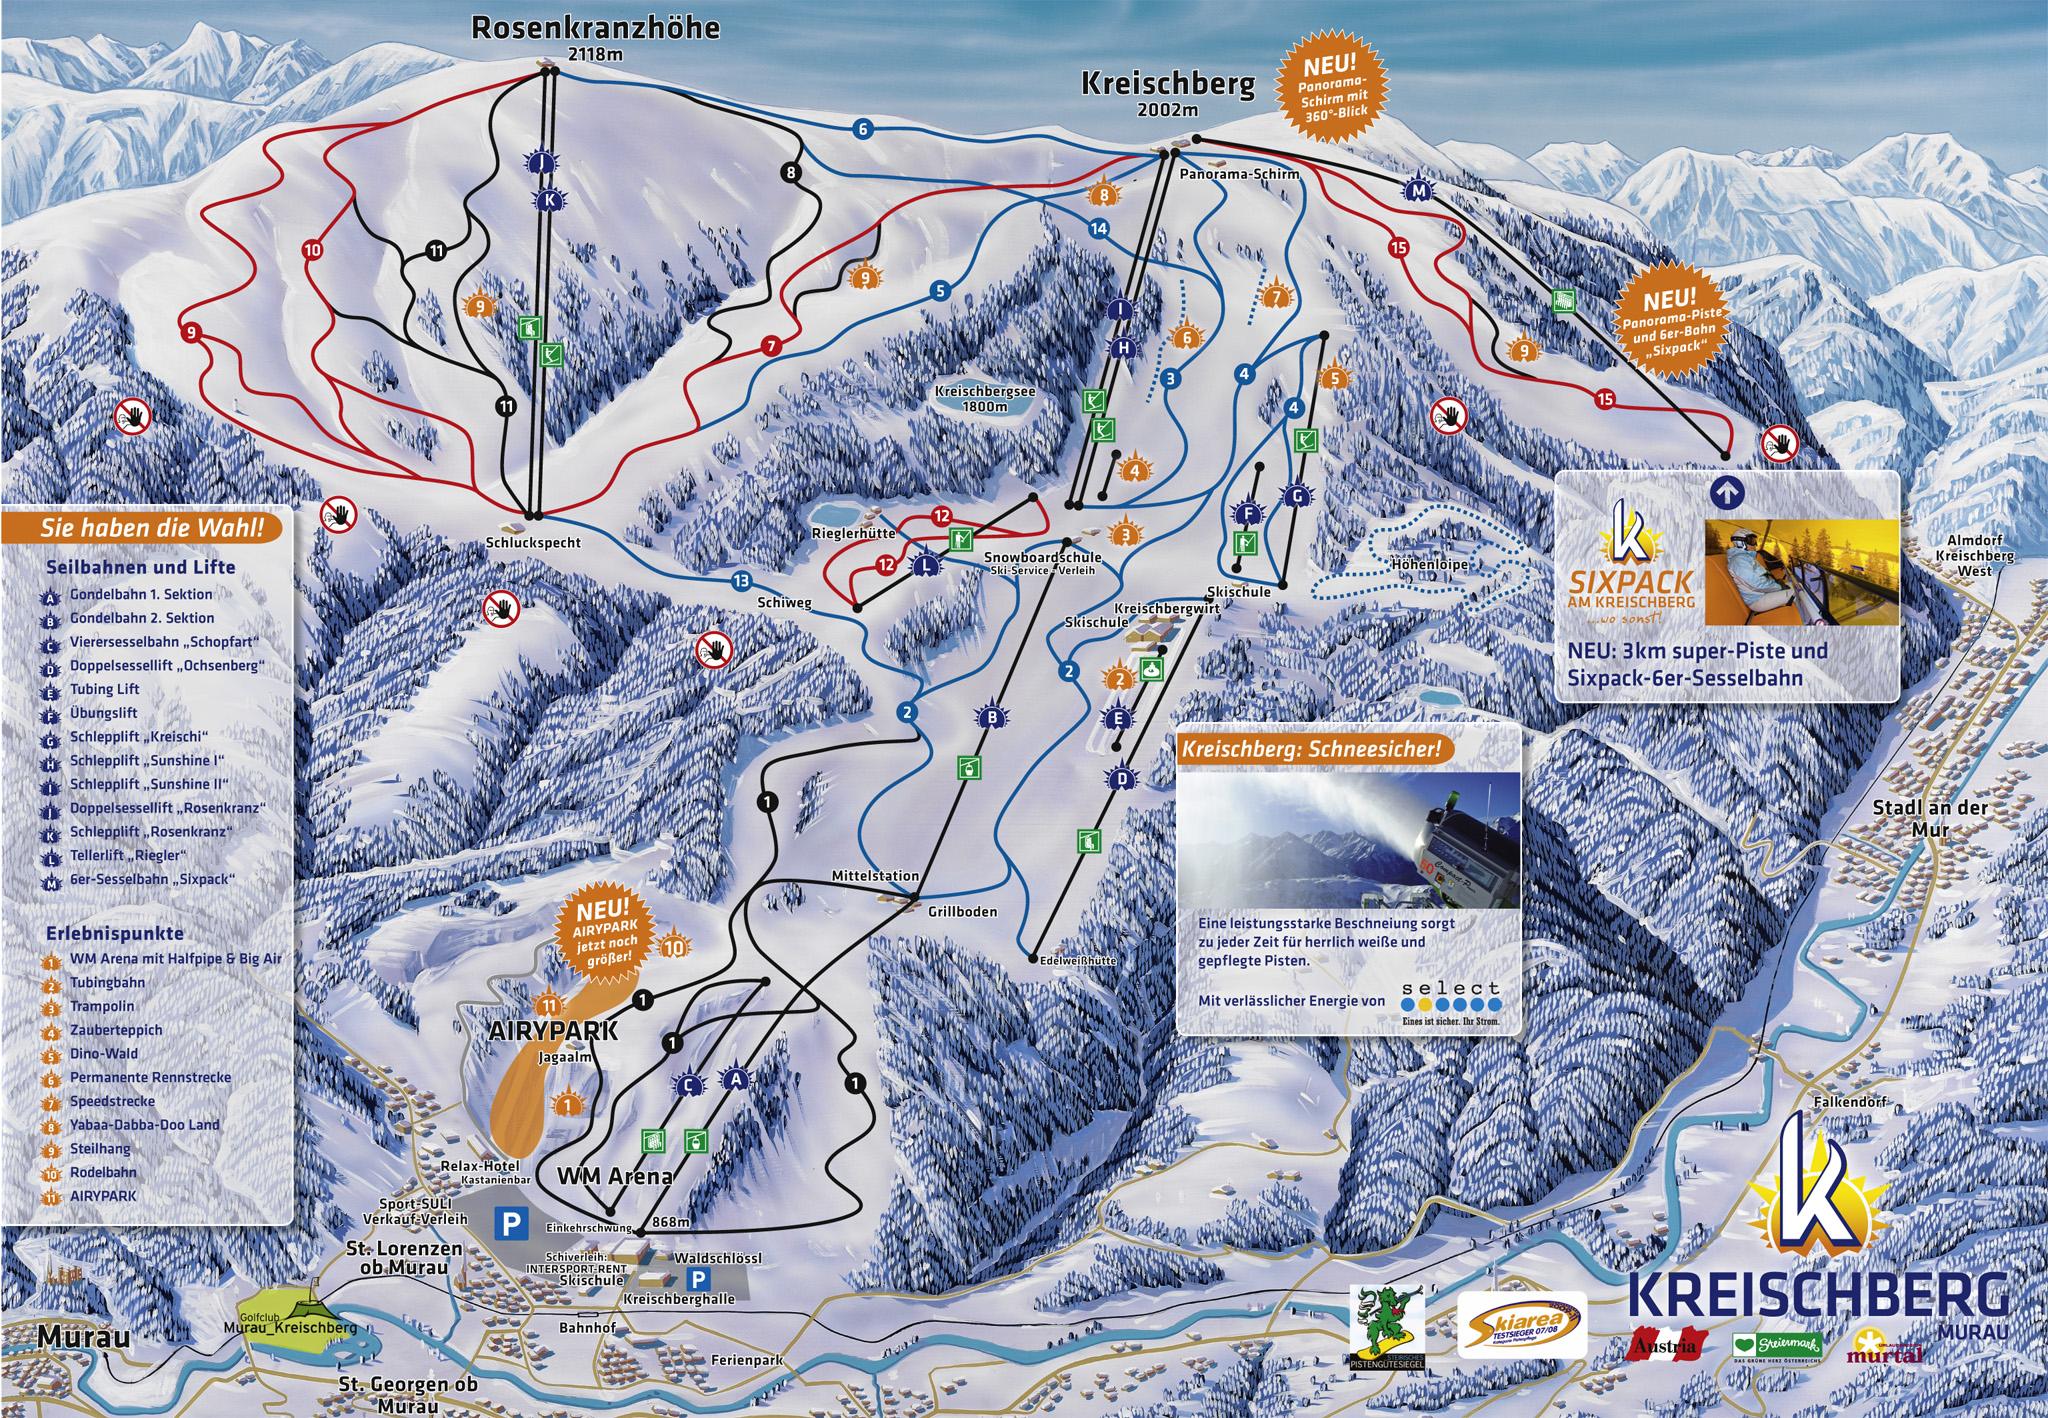 Murau/Kreischberg Piste / Trail Map